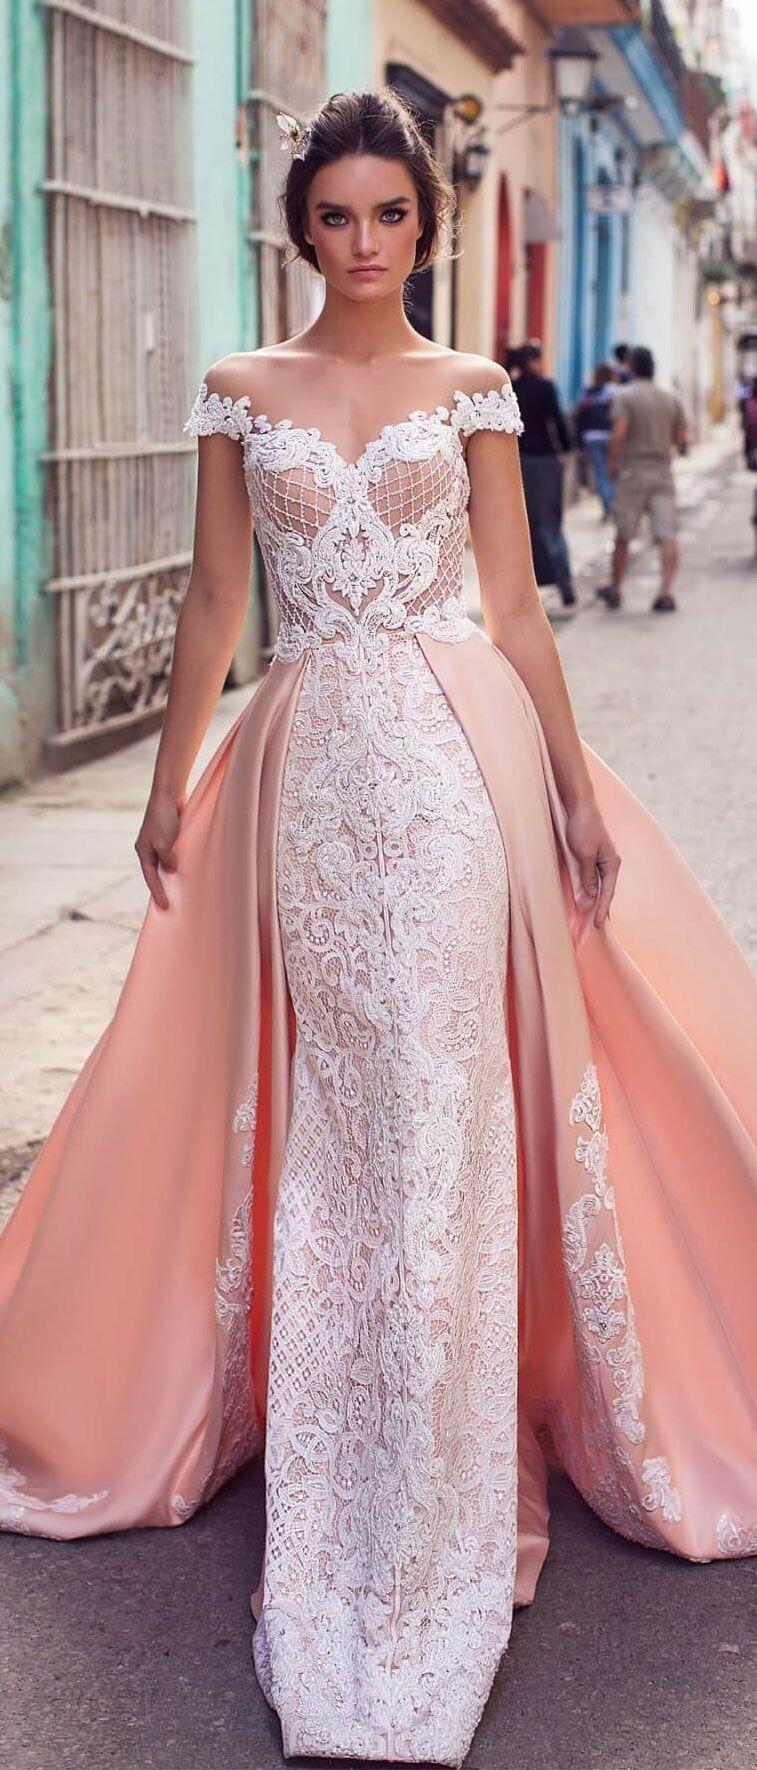 Wedding Dress Inspiration – I Take You | Wedding Dress | Wedding ...